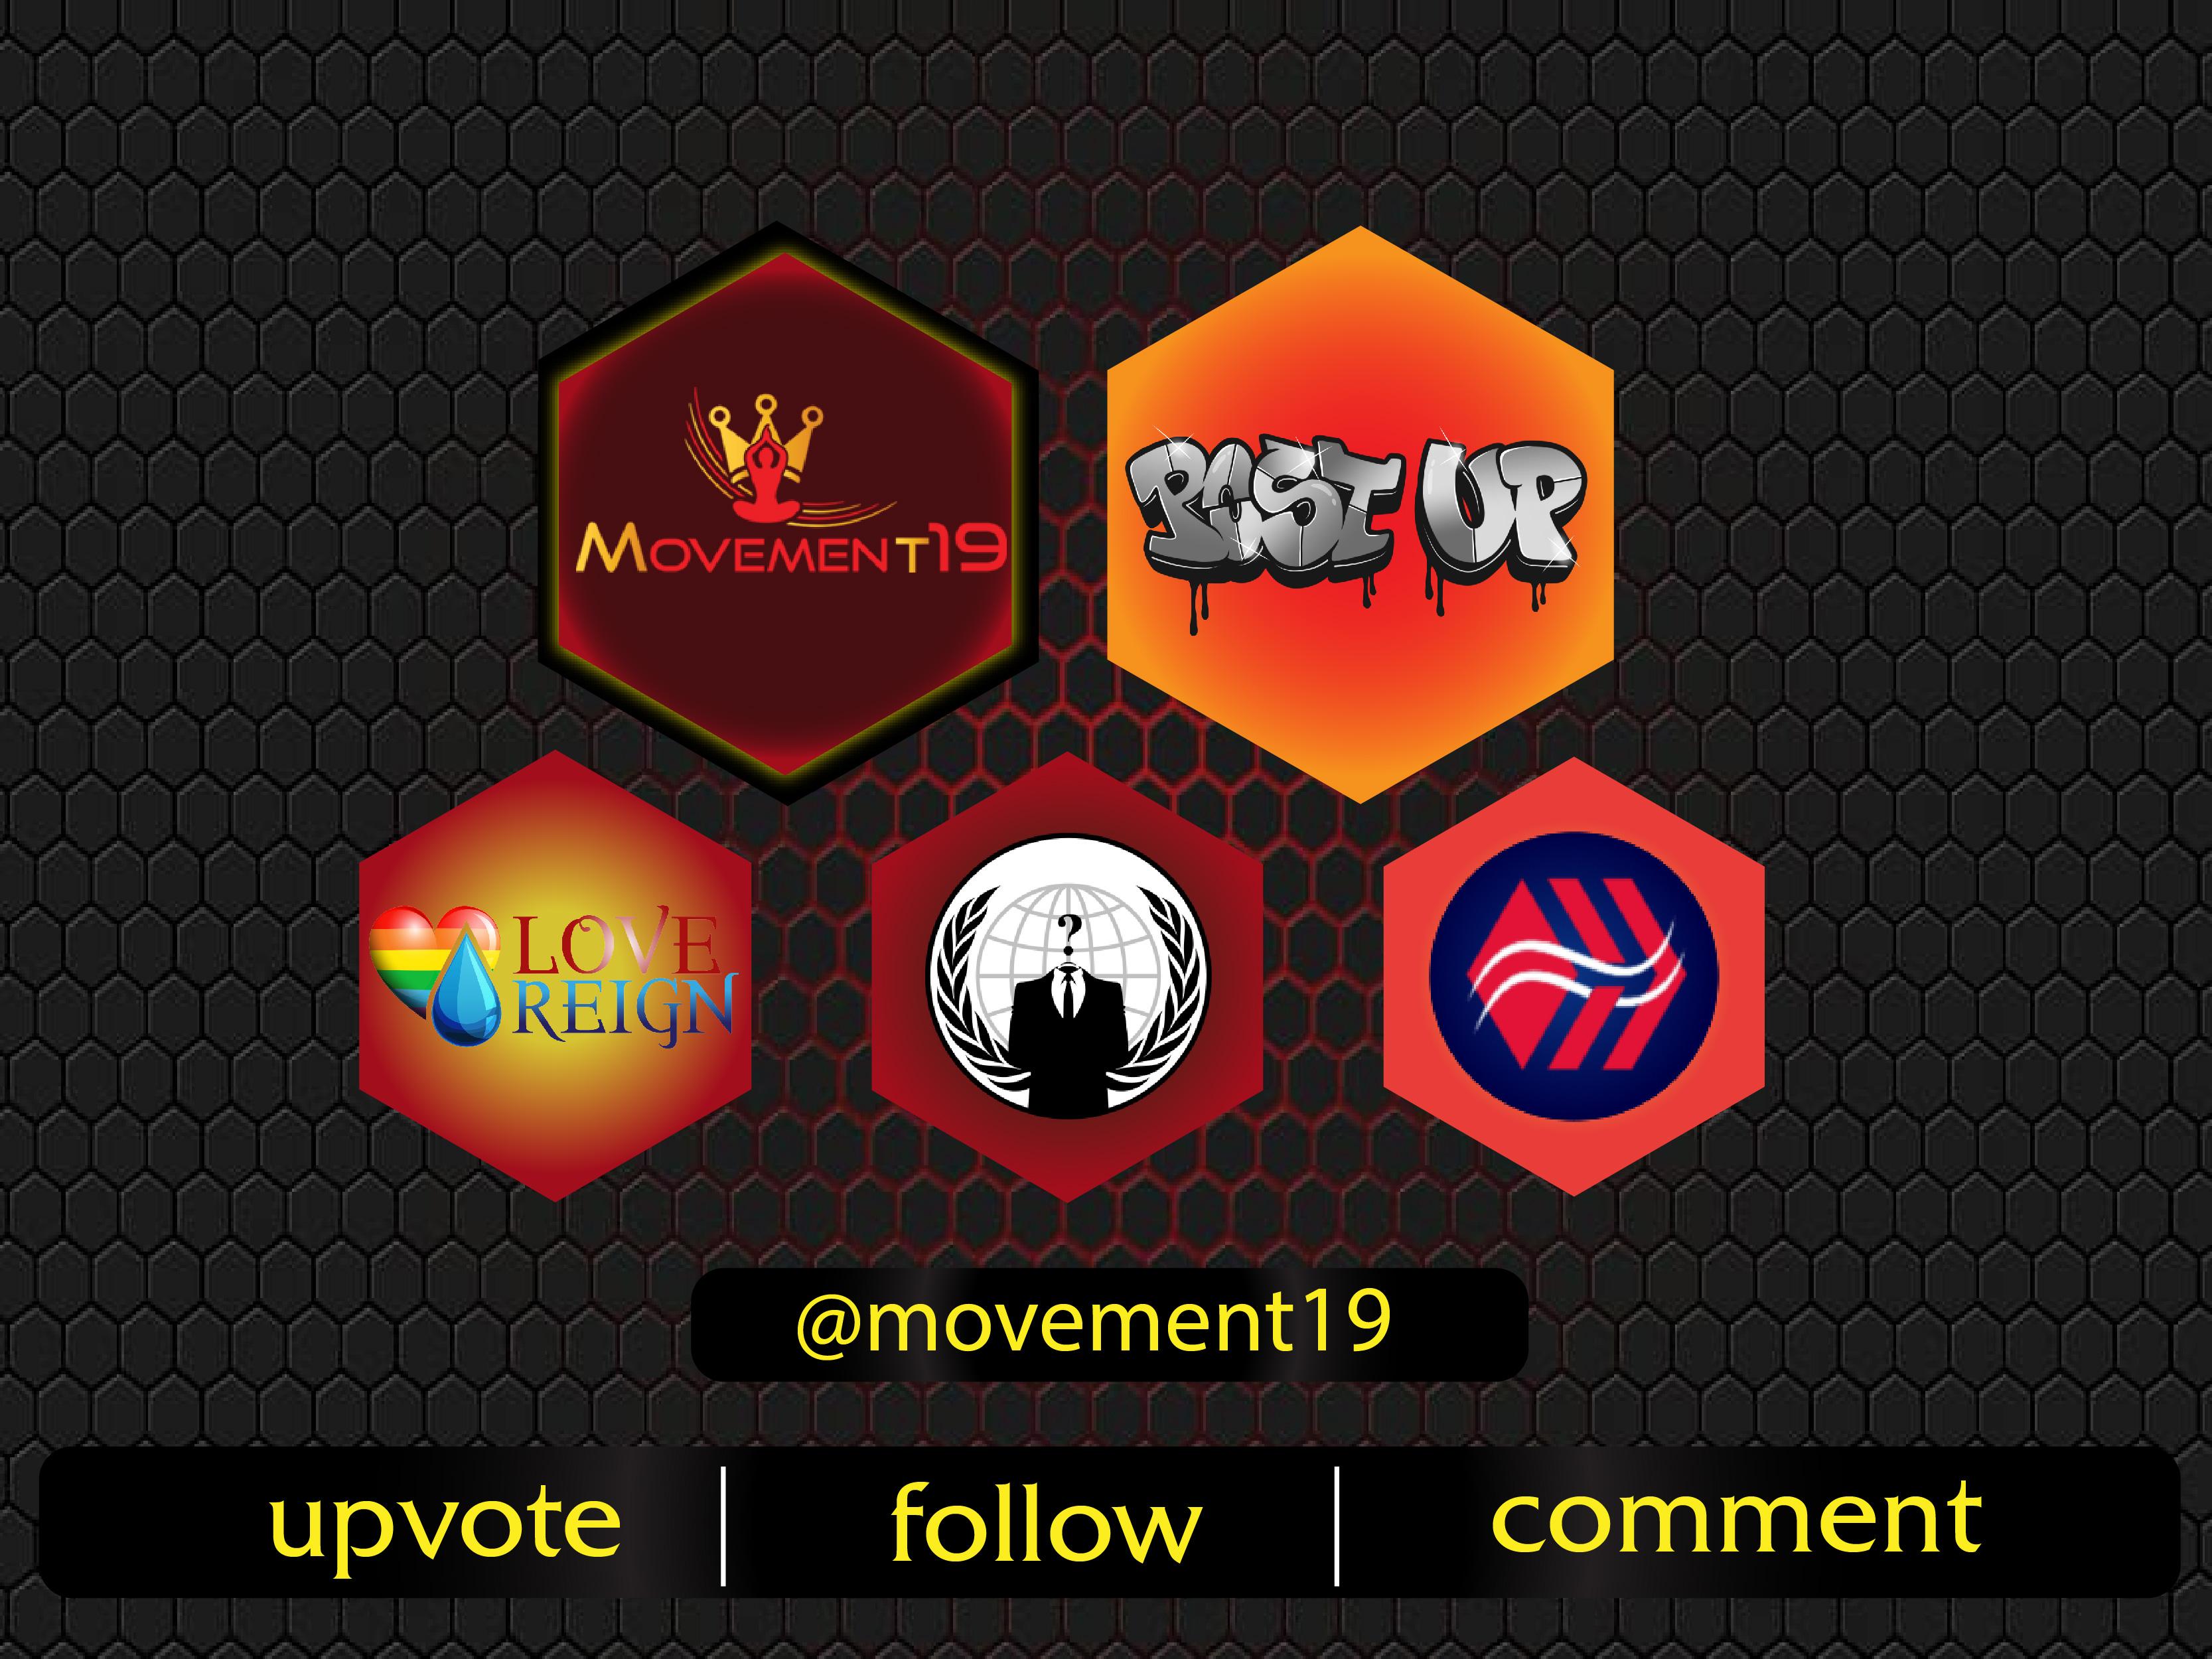 movement19-hive-blog-post-up-cover-image-pic-usman